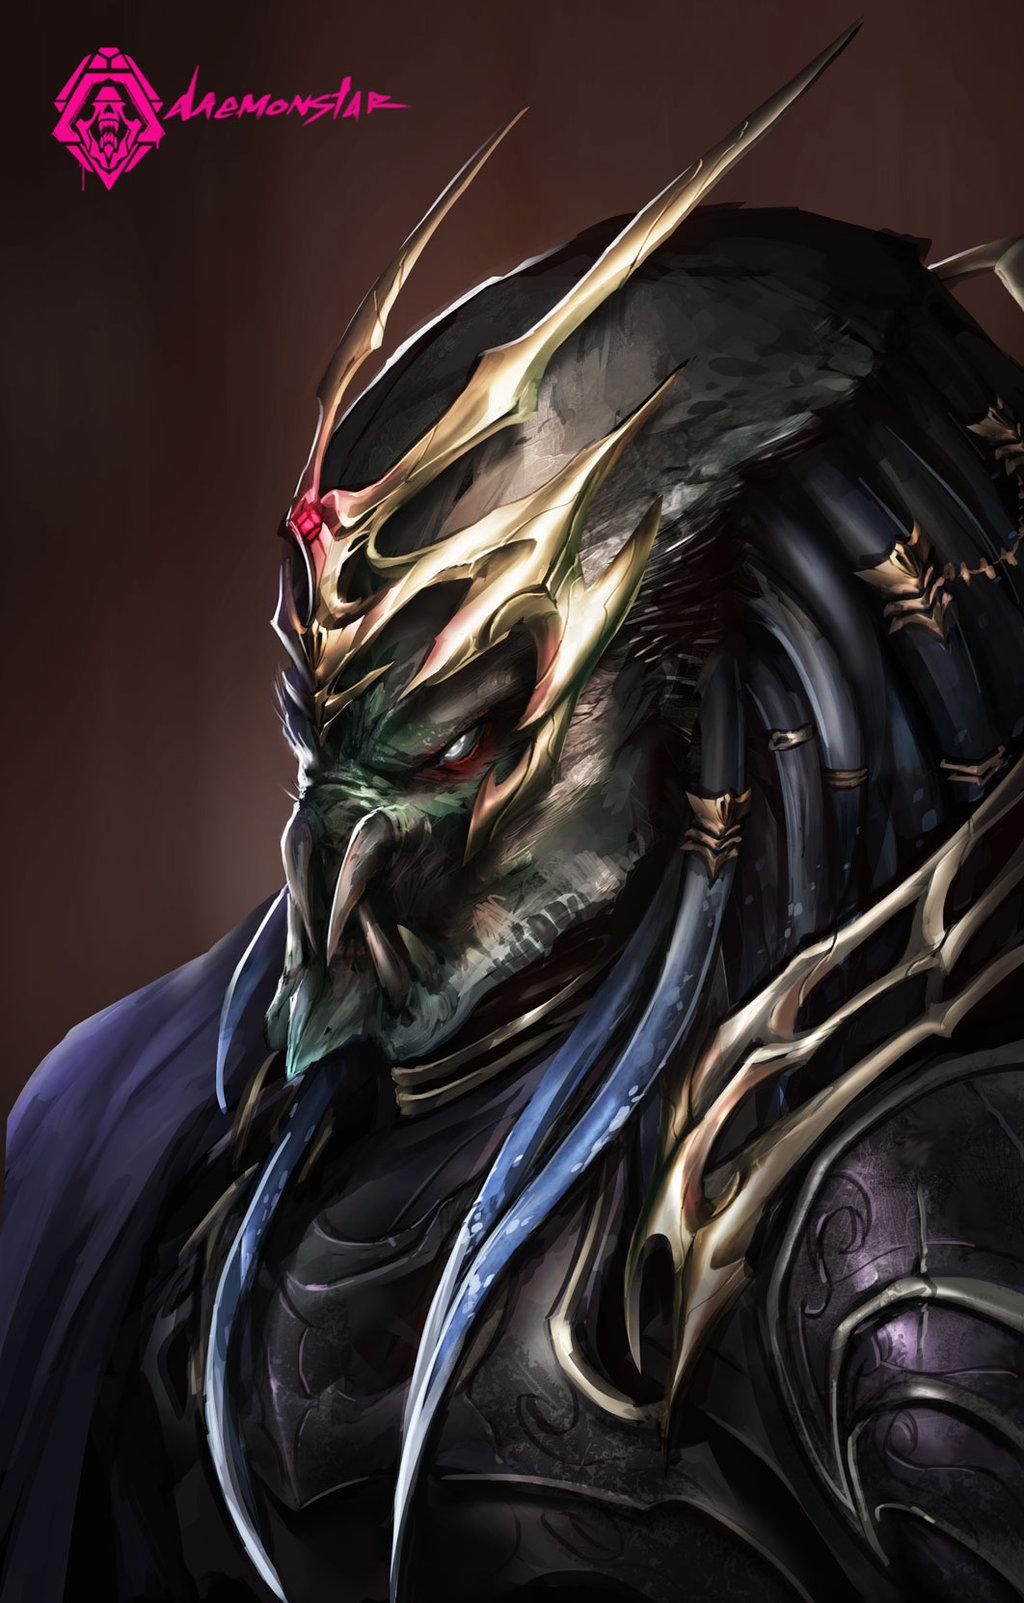 Drawn predator king By PredatorKing daemonstar DeviantArt by